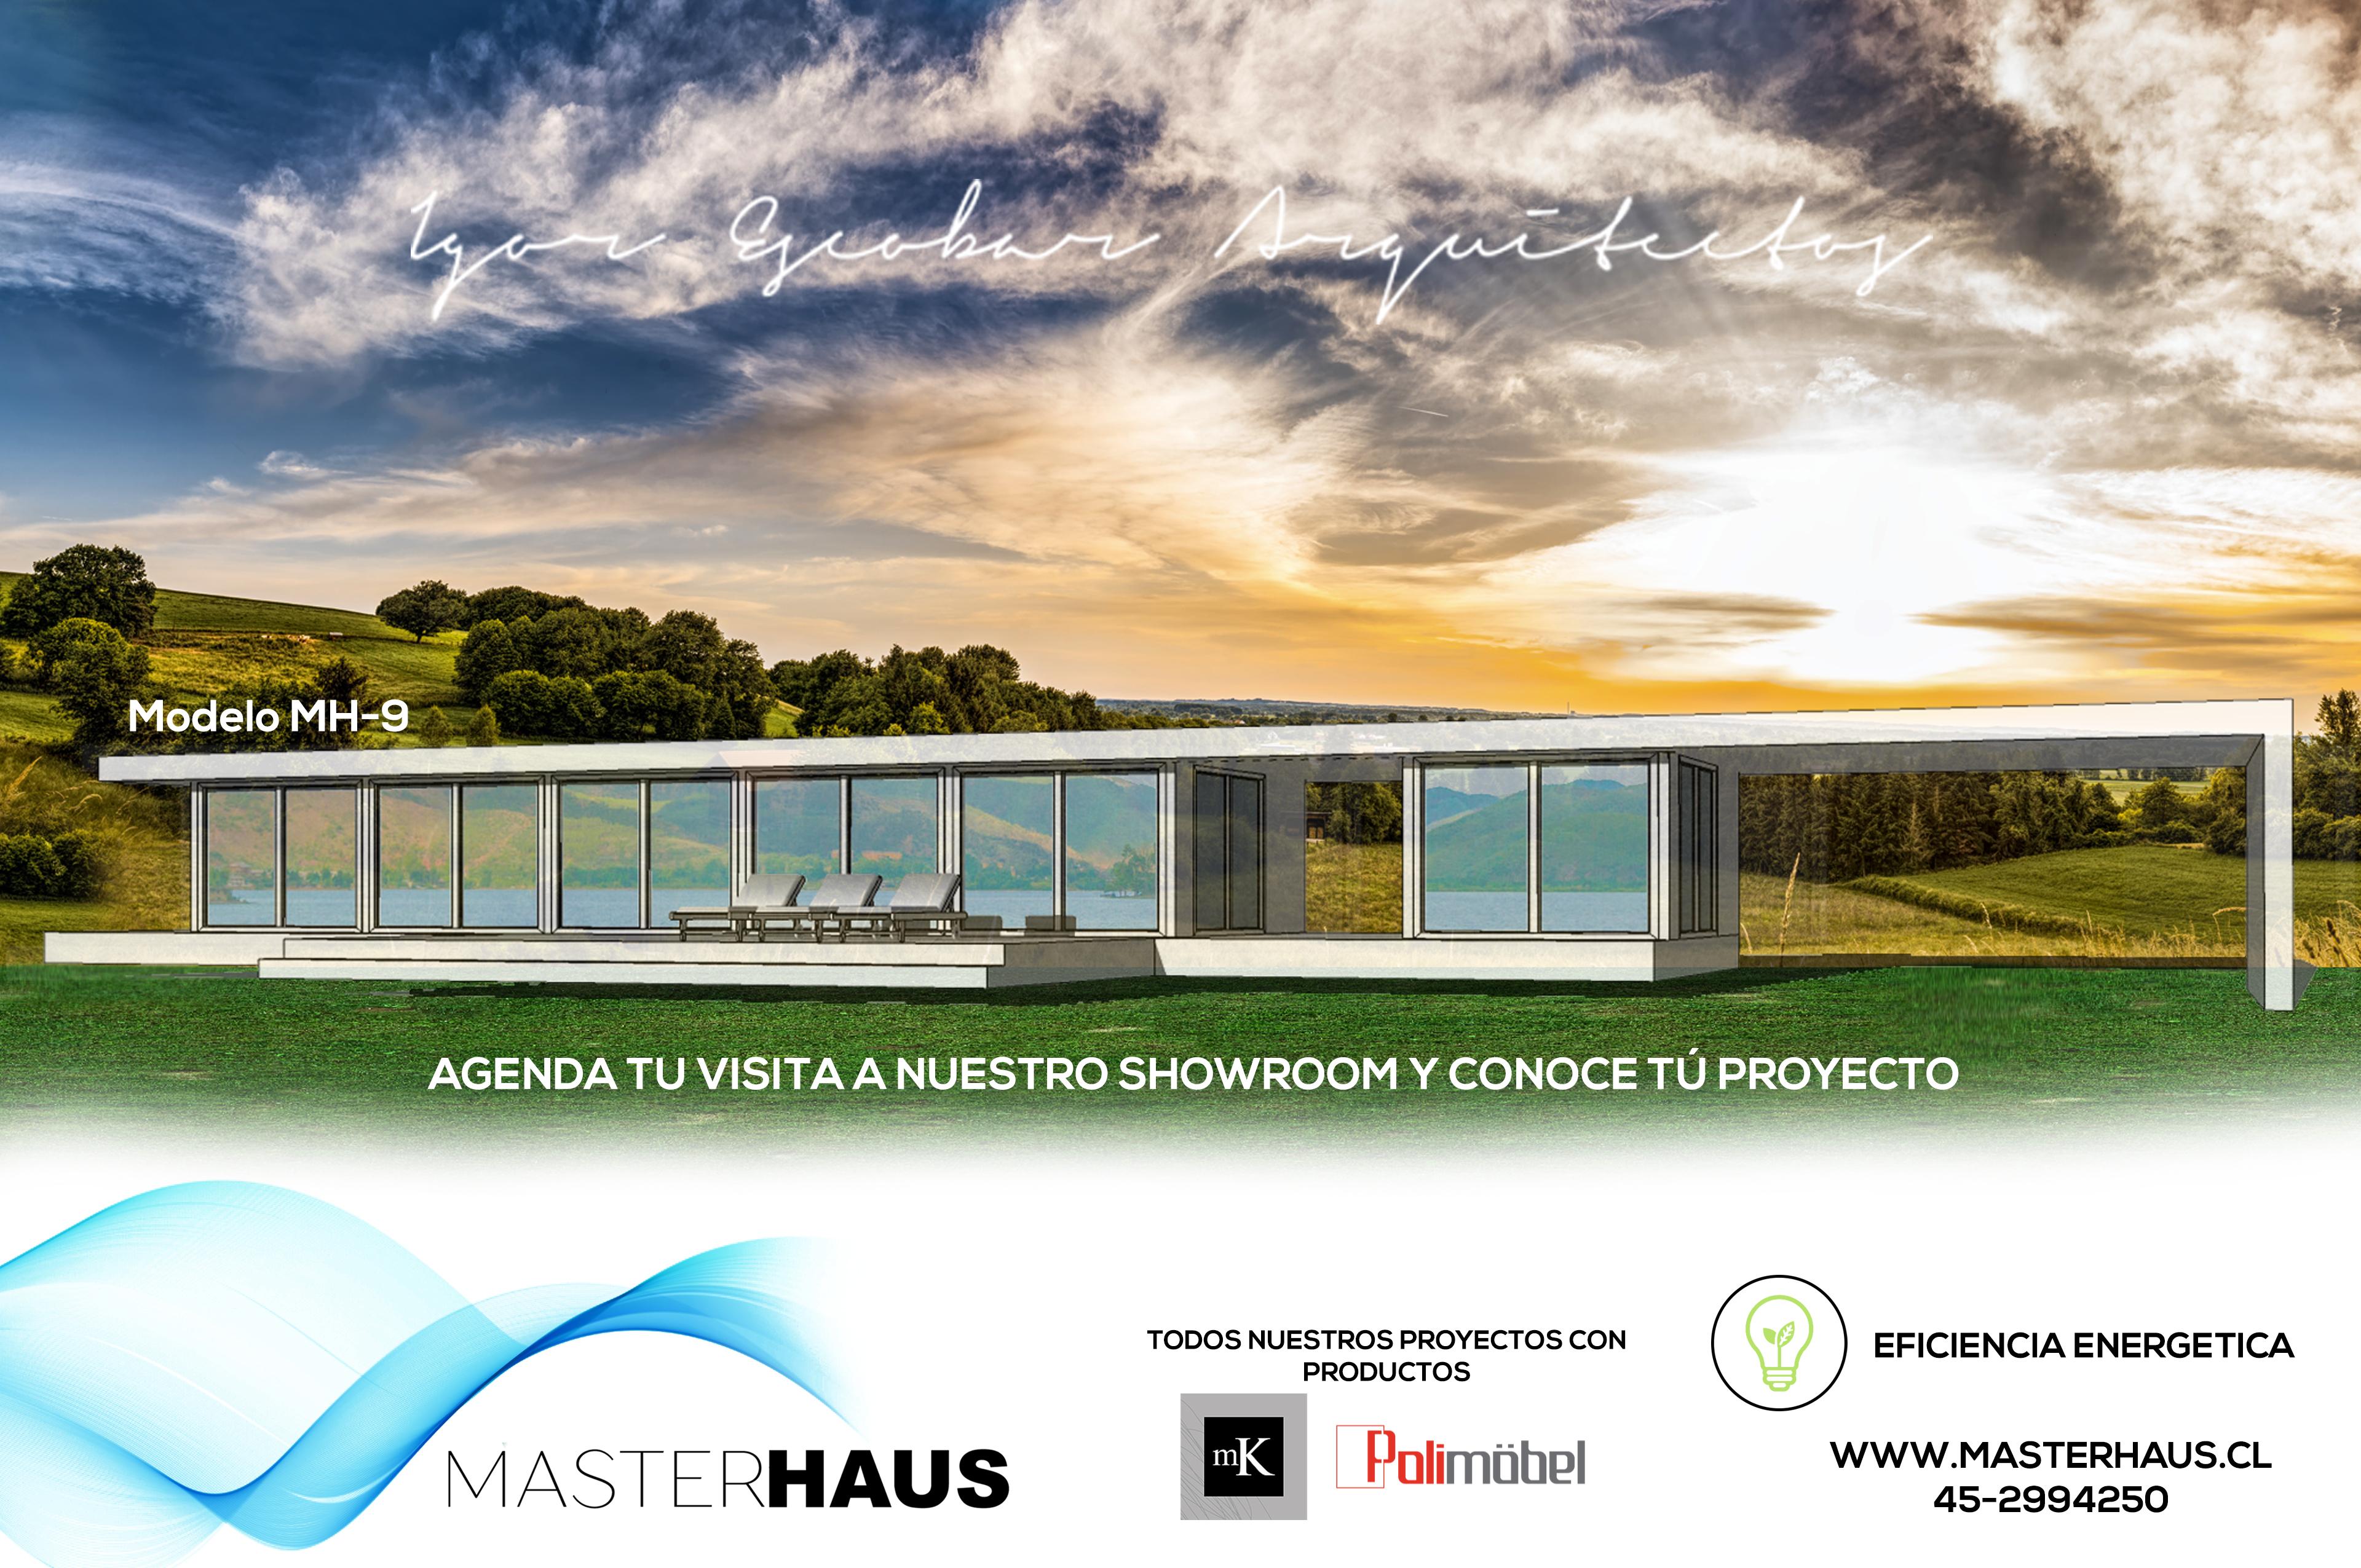 Masterhaus/IEA mod. MH-9